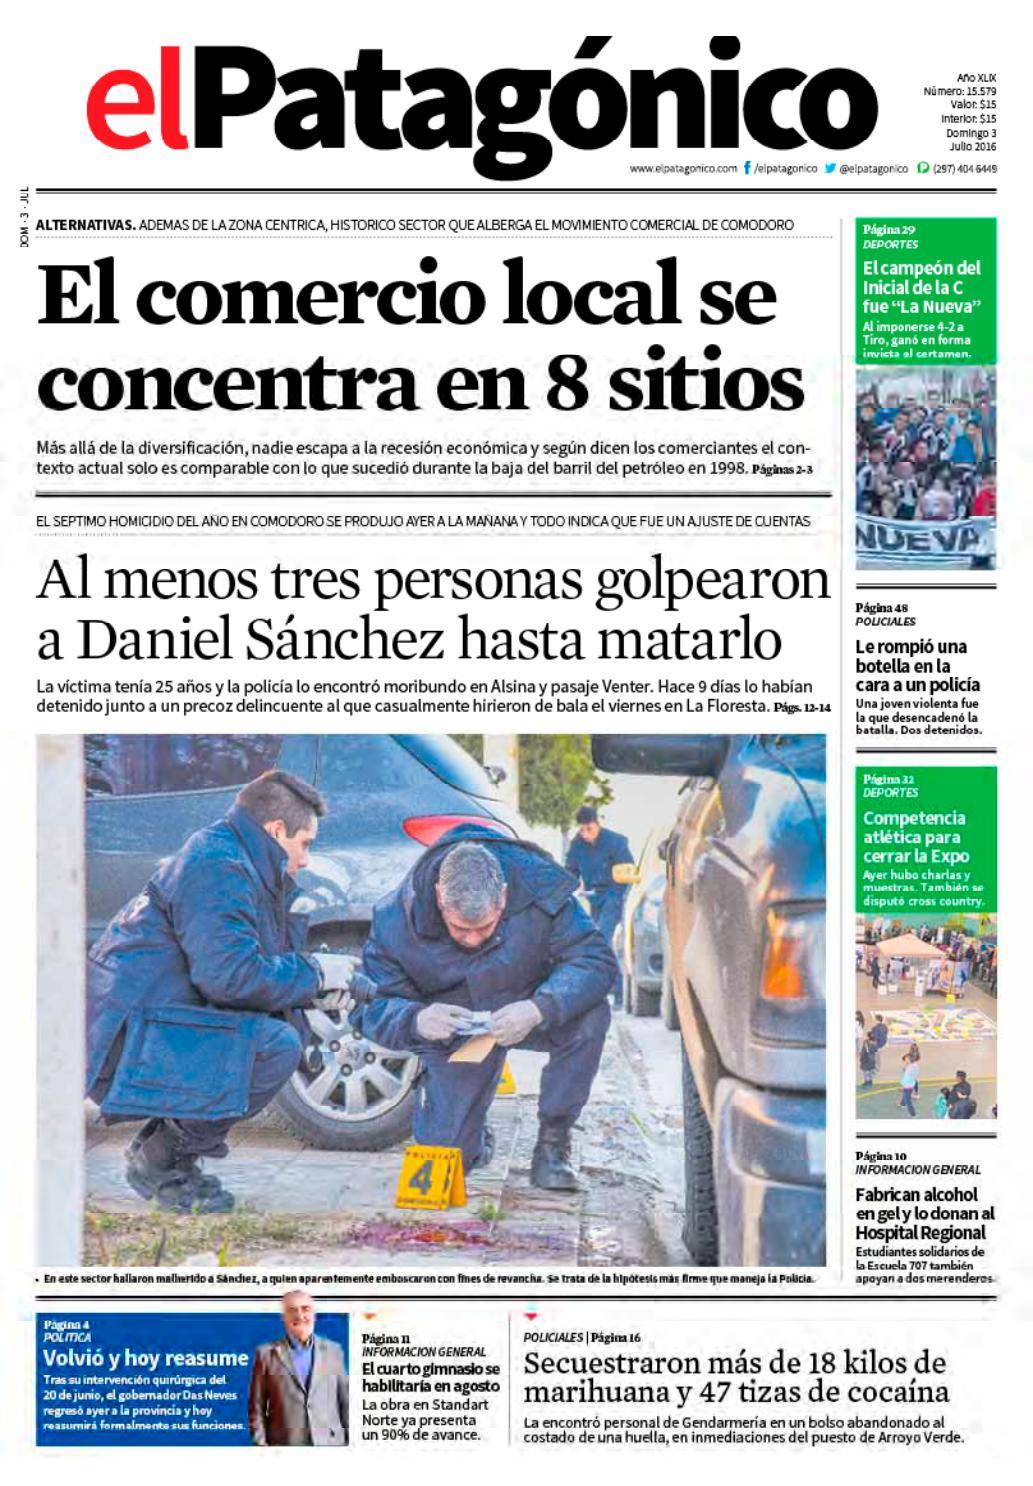 edicion233202072016.pdf by El Patagonico - issuu